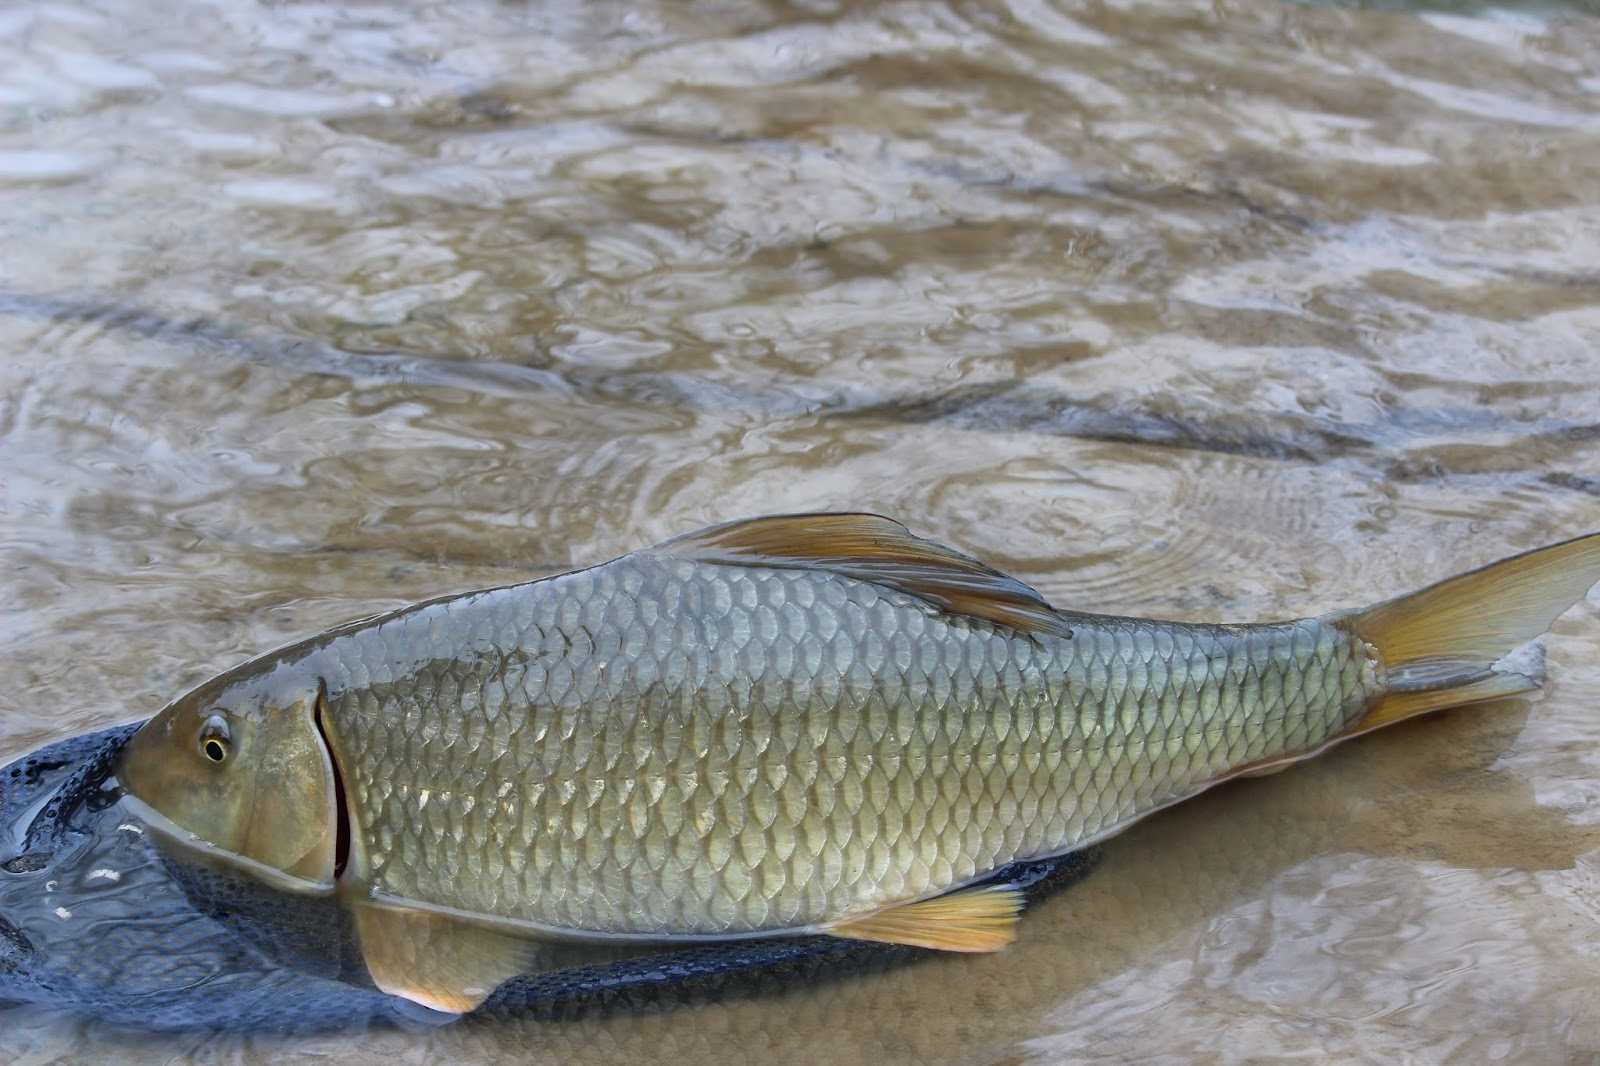 Maumee River Report- Febuary 2, 2018